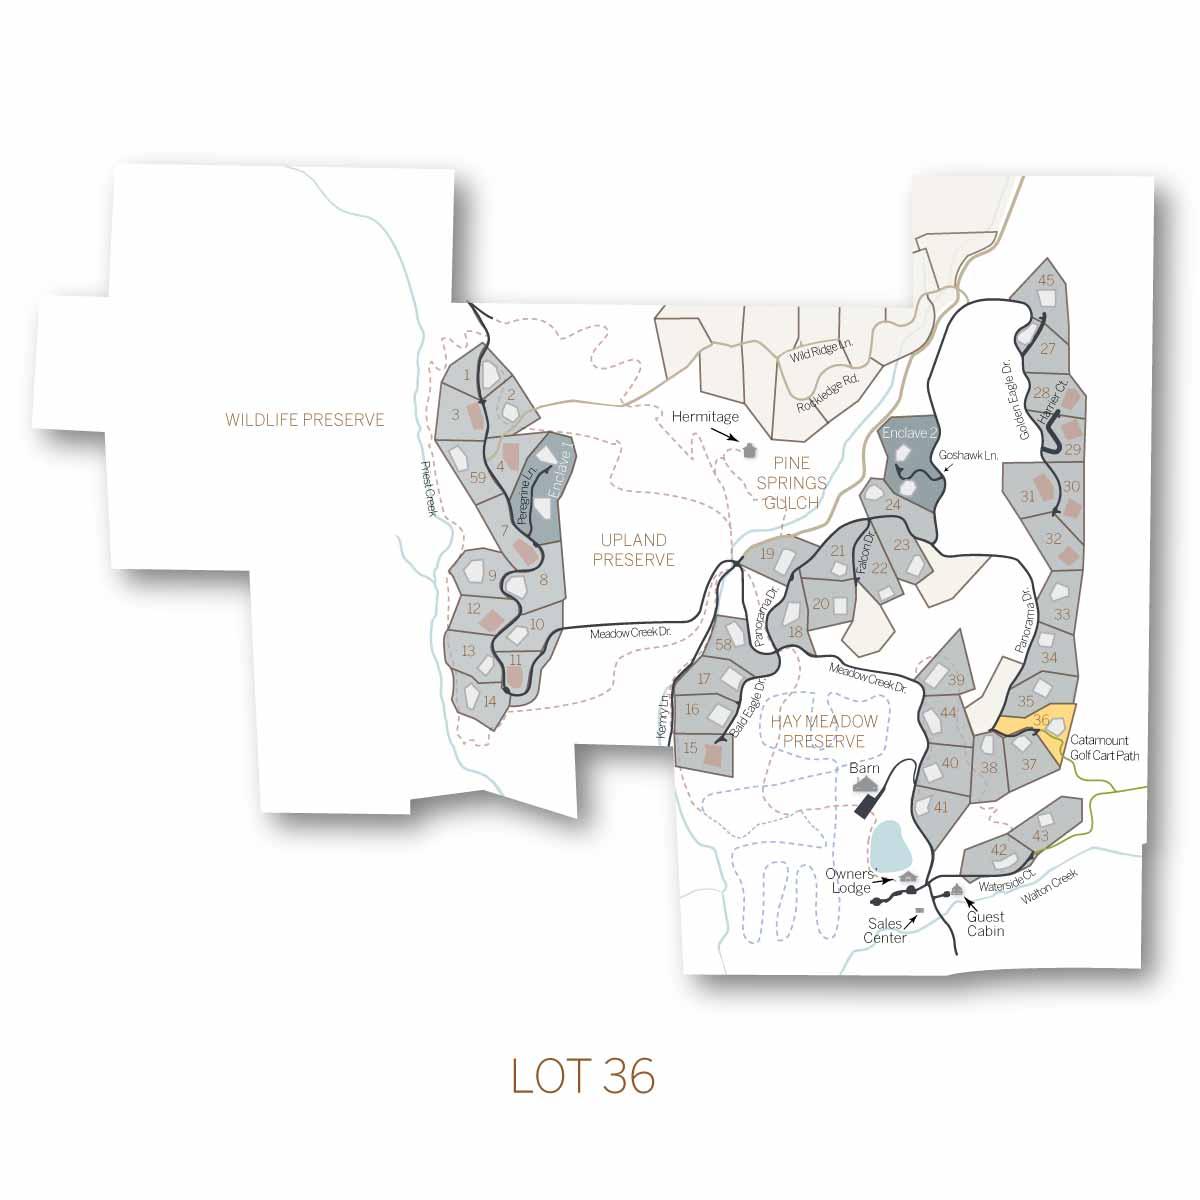 lot 36 - Homesite #36